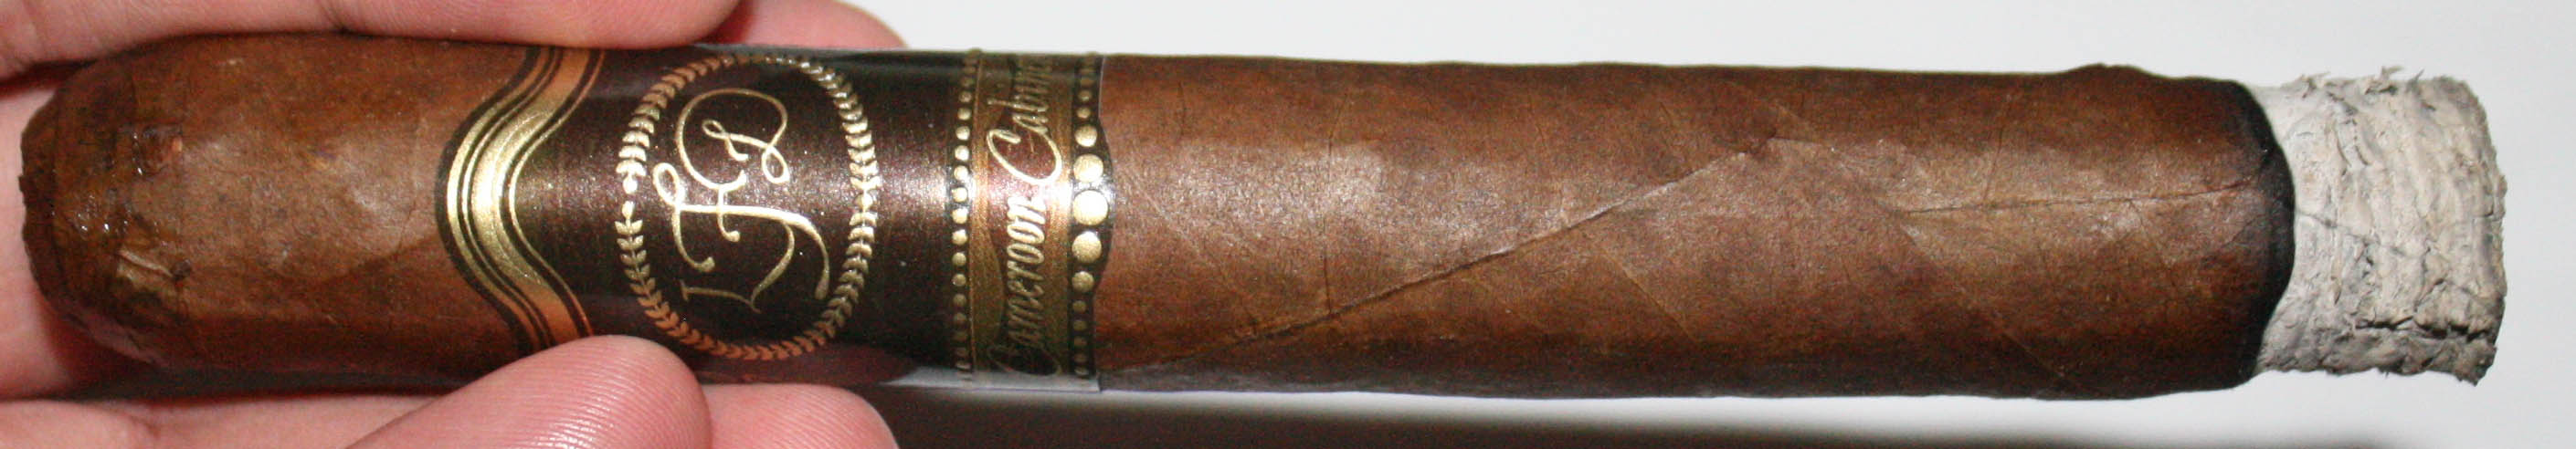 La Flor Dominicana Cameroon Cabinets - Cigar Review